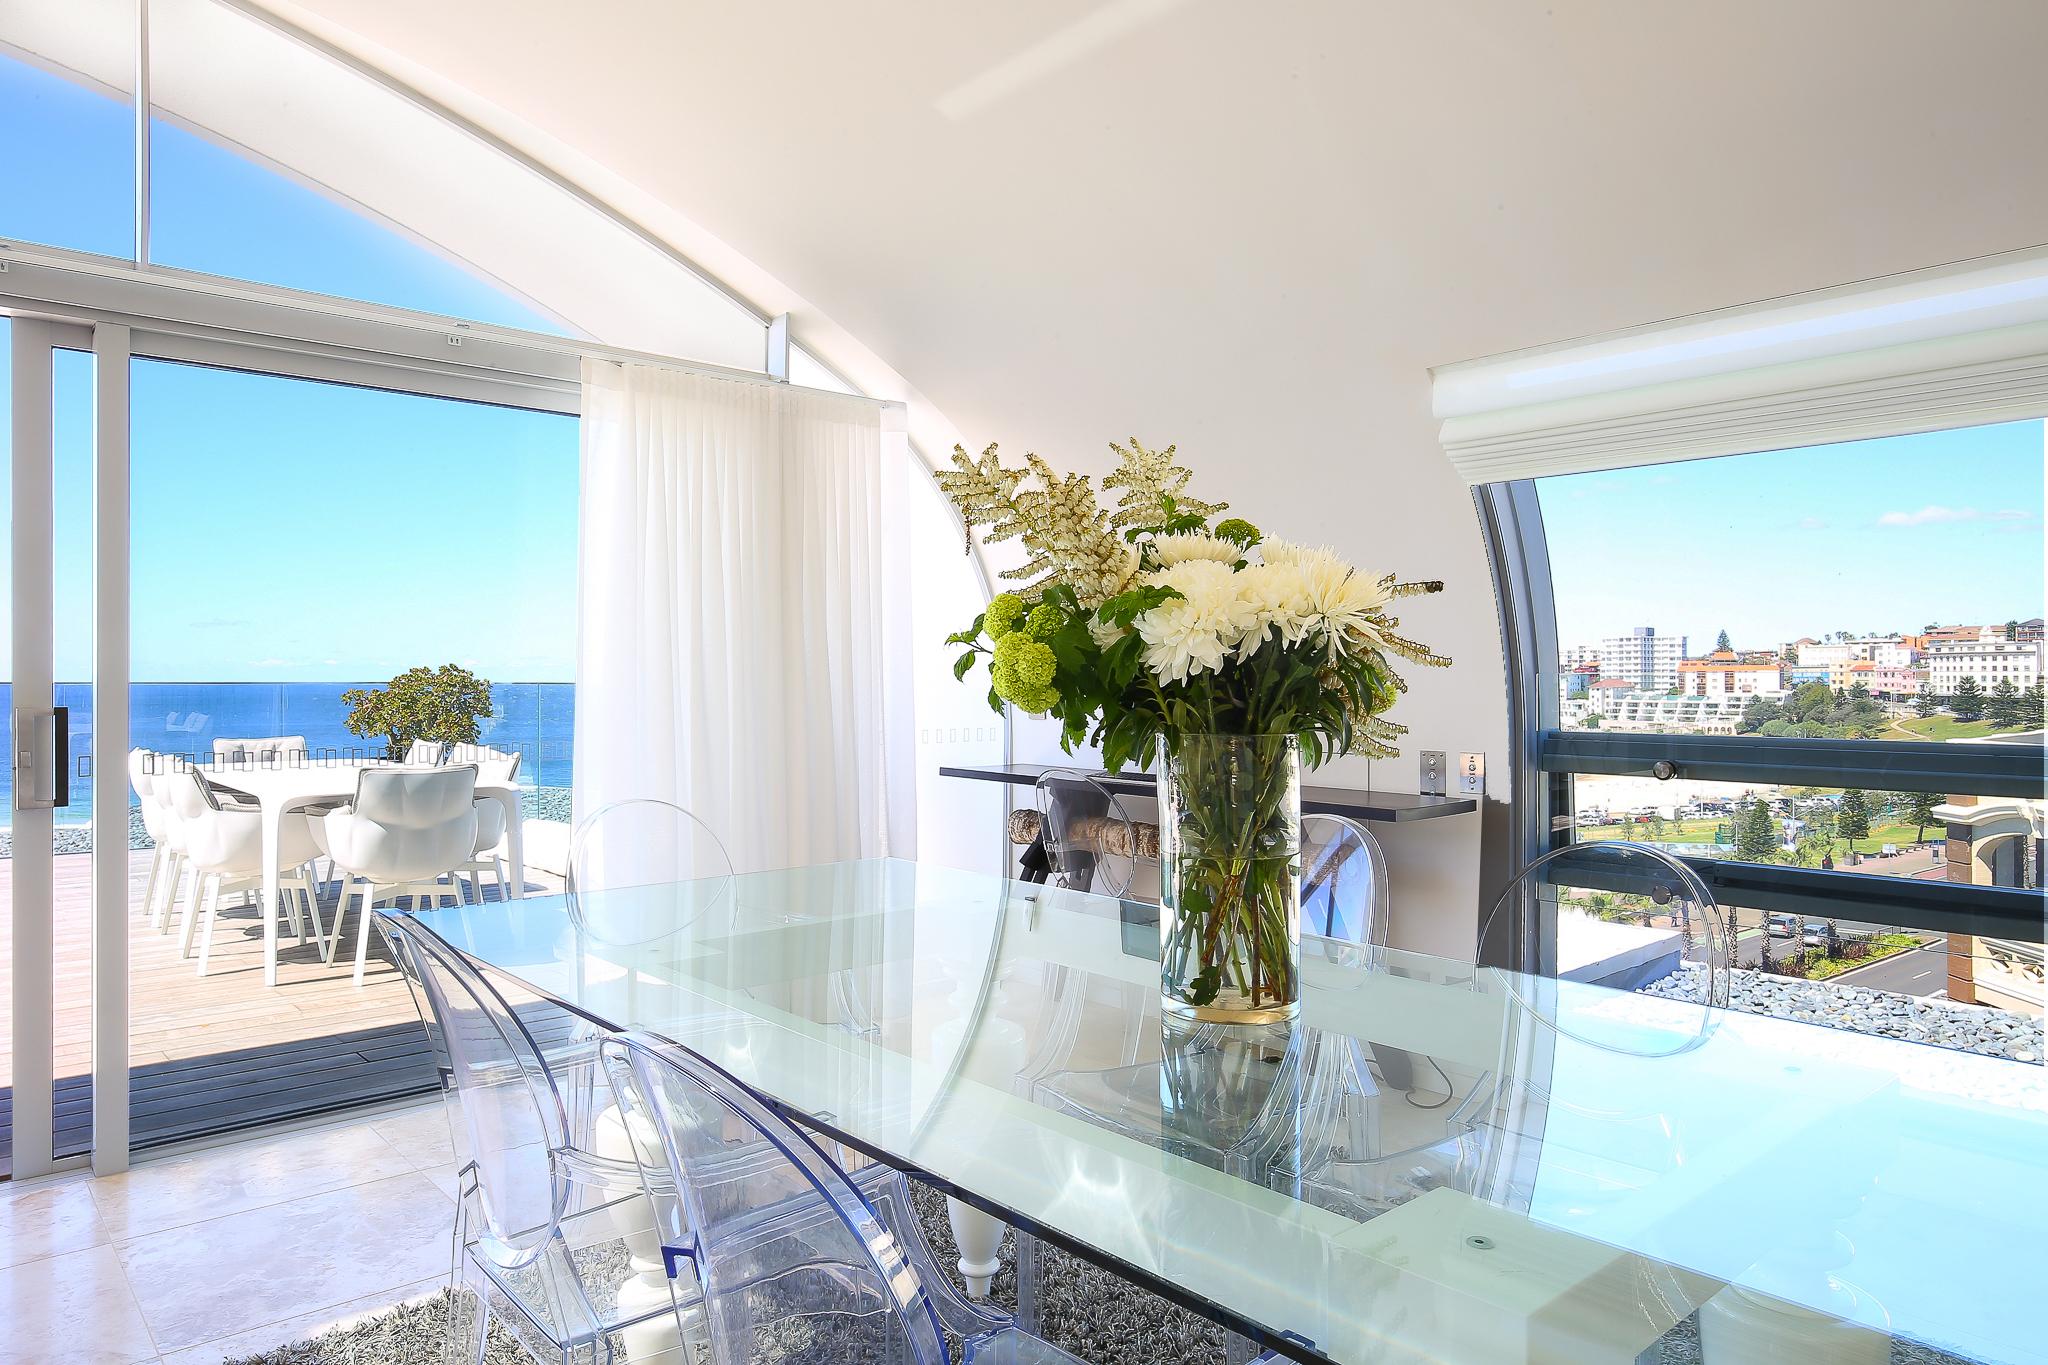 2 Storey Residential House Design